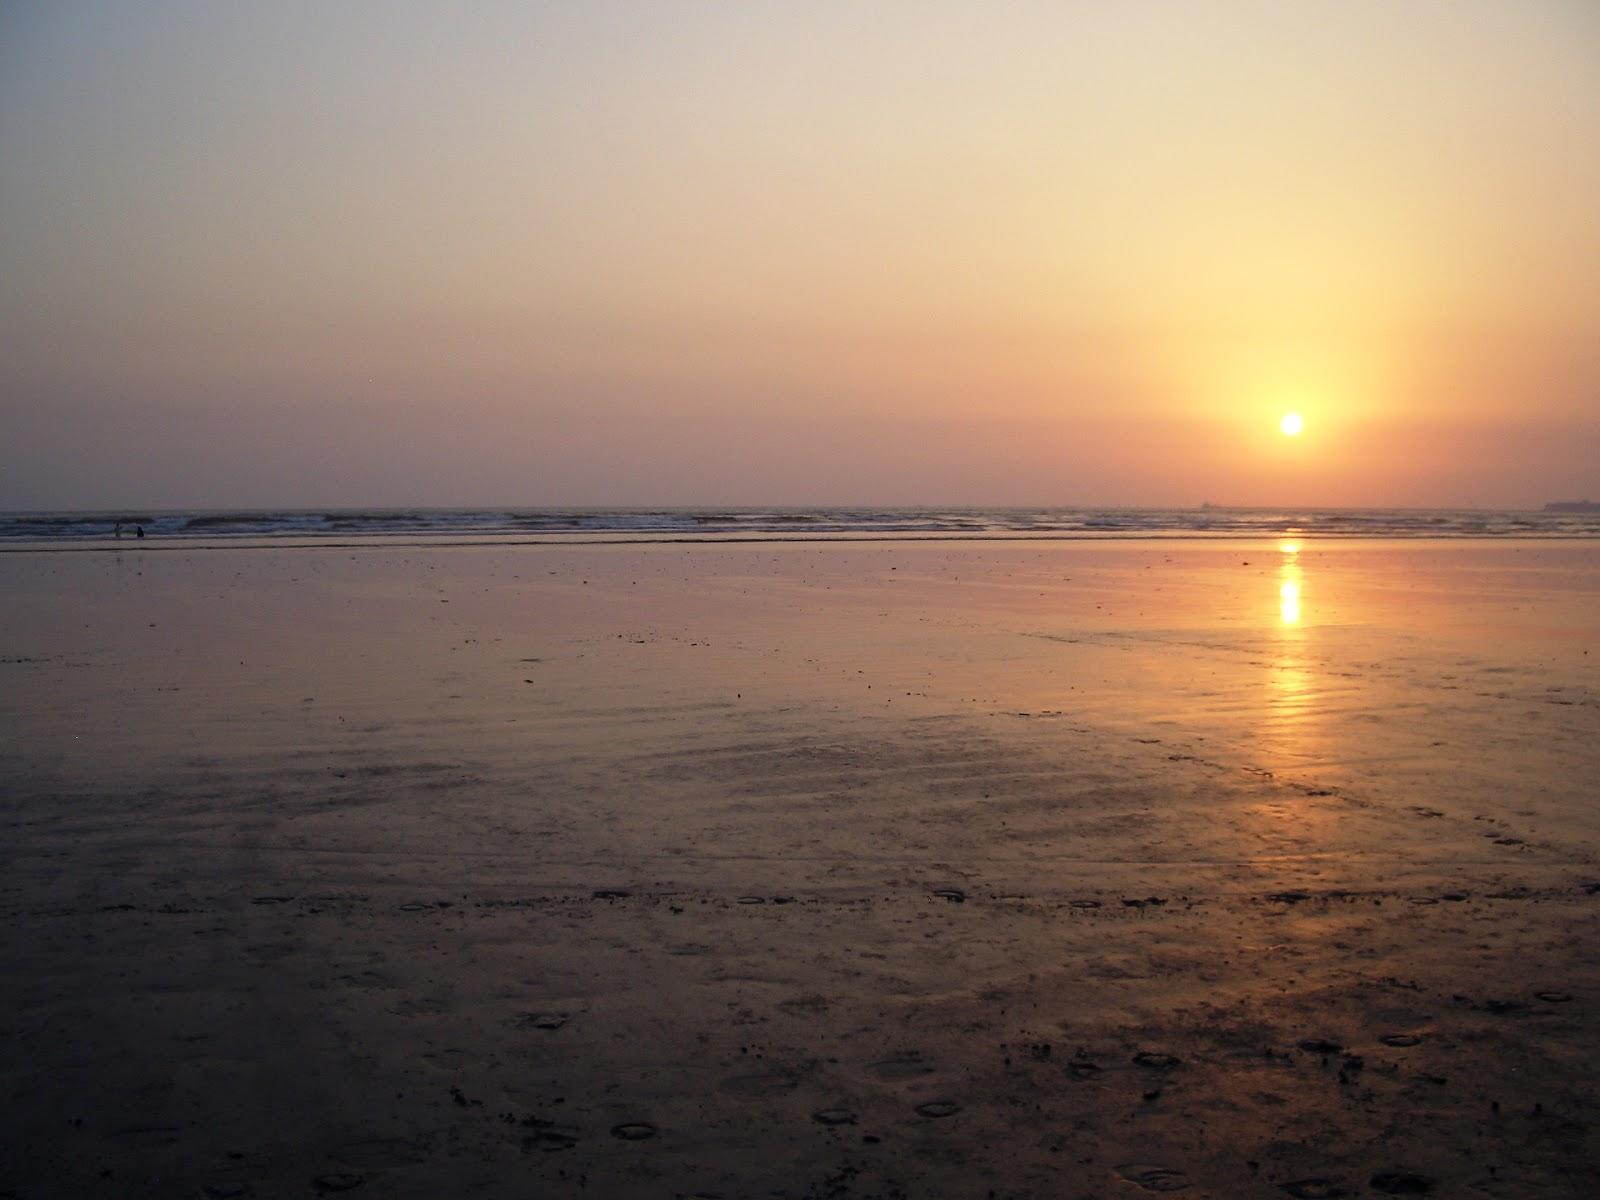 http://2.bp.blogspot.com/-ux-oh46lXJ8/UJSs4hNXhjI/AAAAAAAABK4/QG43VmeenU8/s1600/Beautiful-location-of-sun-set-at-karachi-sea-view-image-wallpaper-background-for-desktop-laptop.JPG